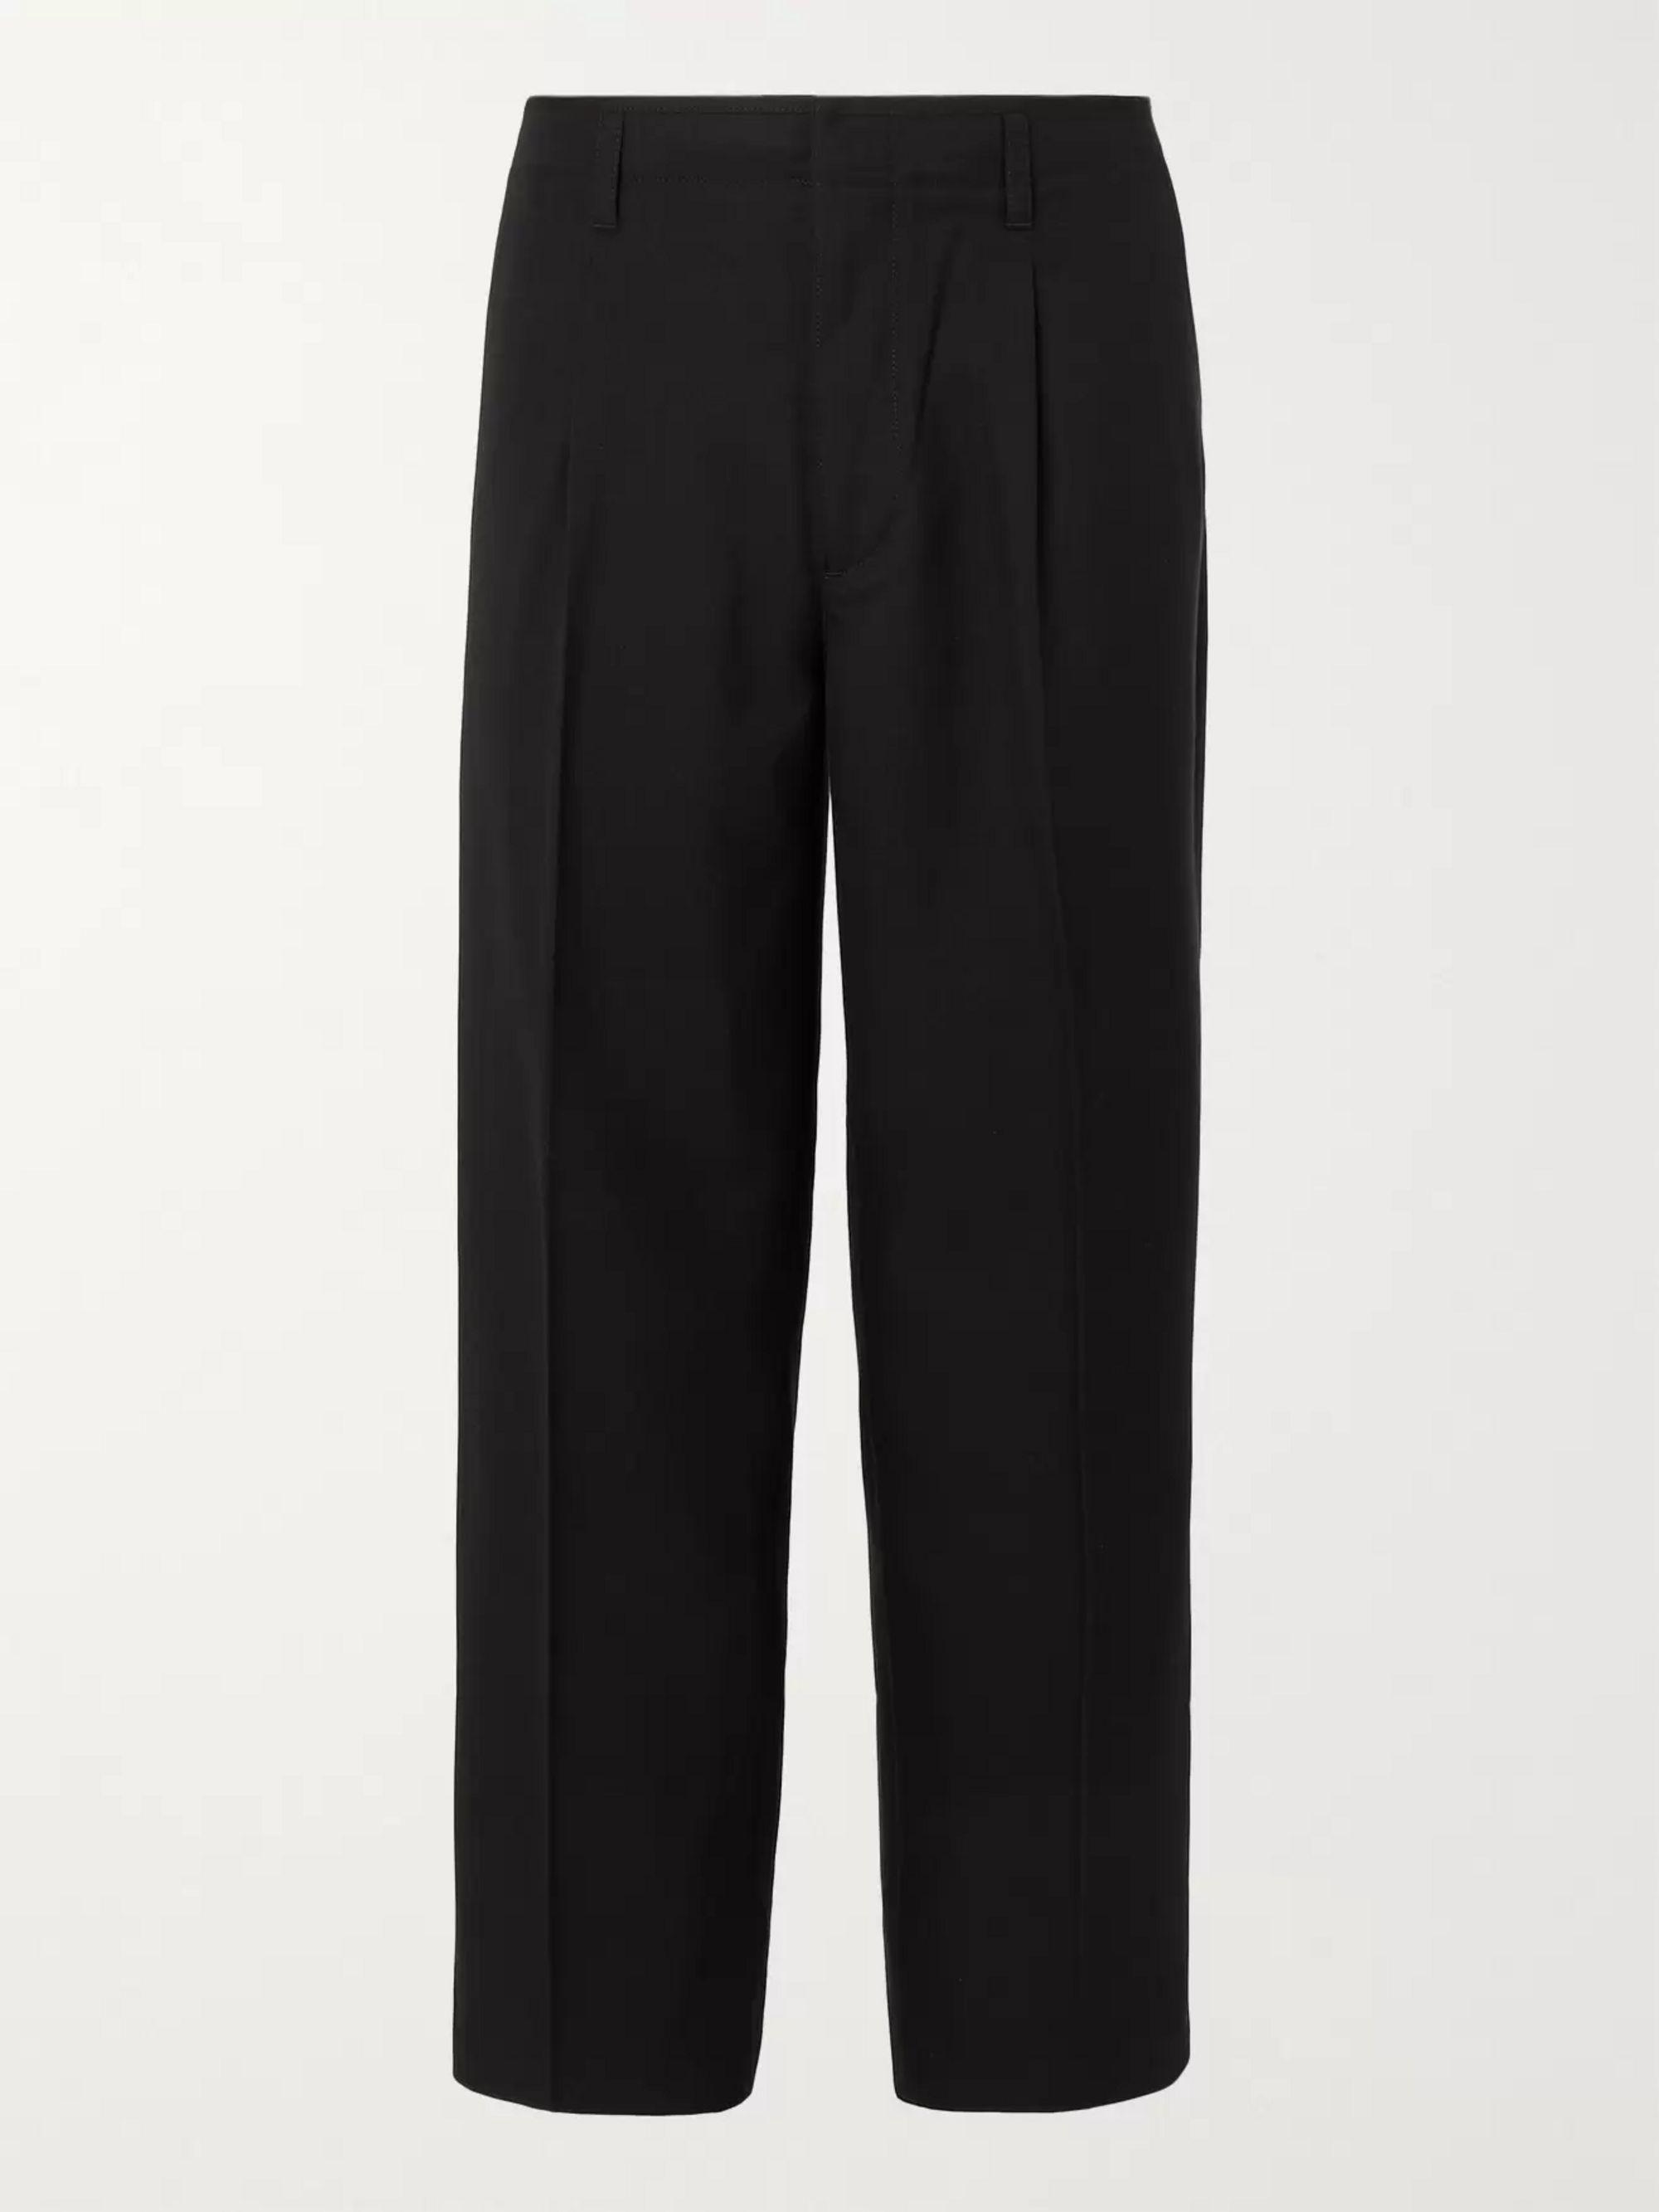 CLUB MONACO Woven Trousers